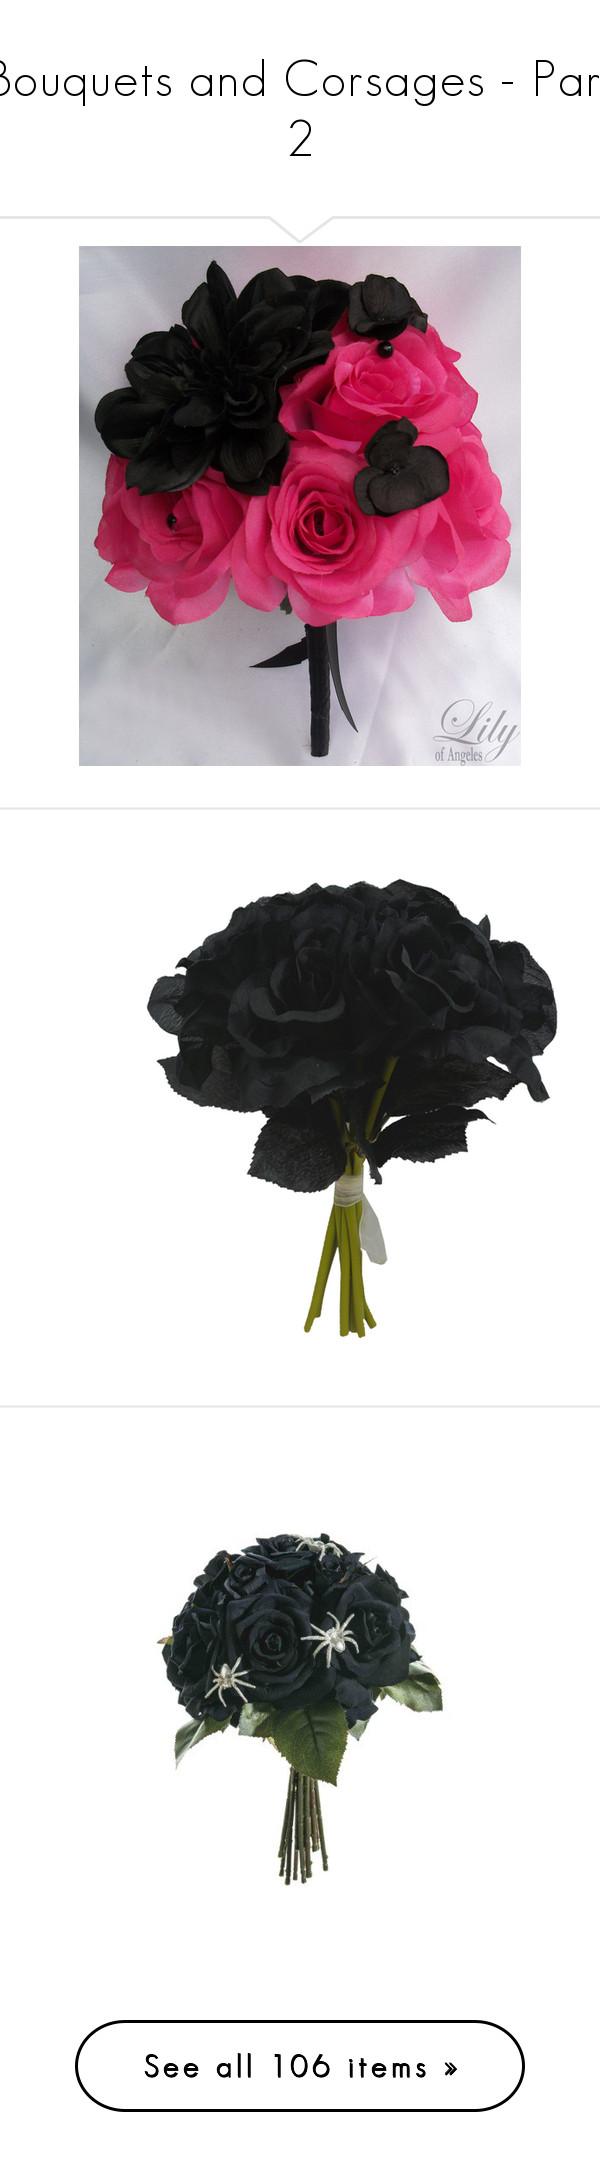 Bouquets and corsages part